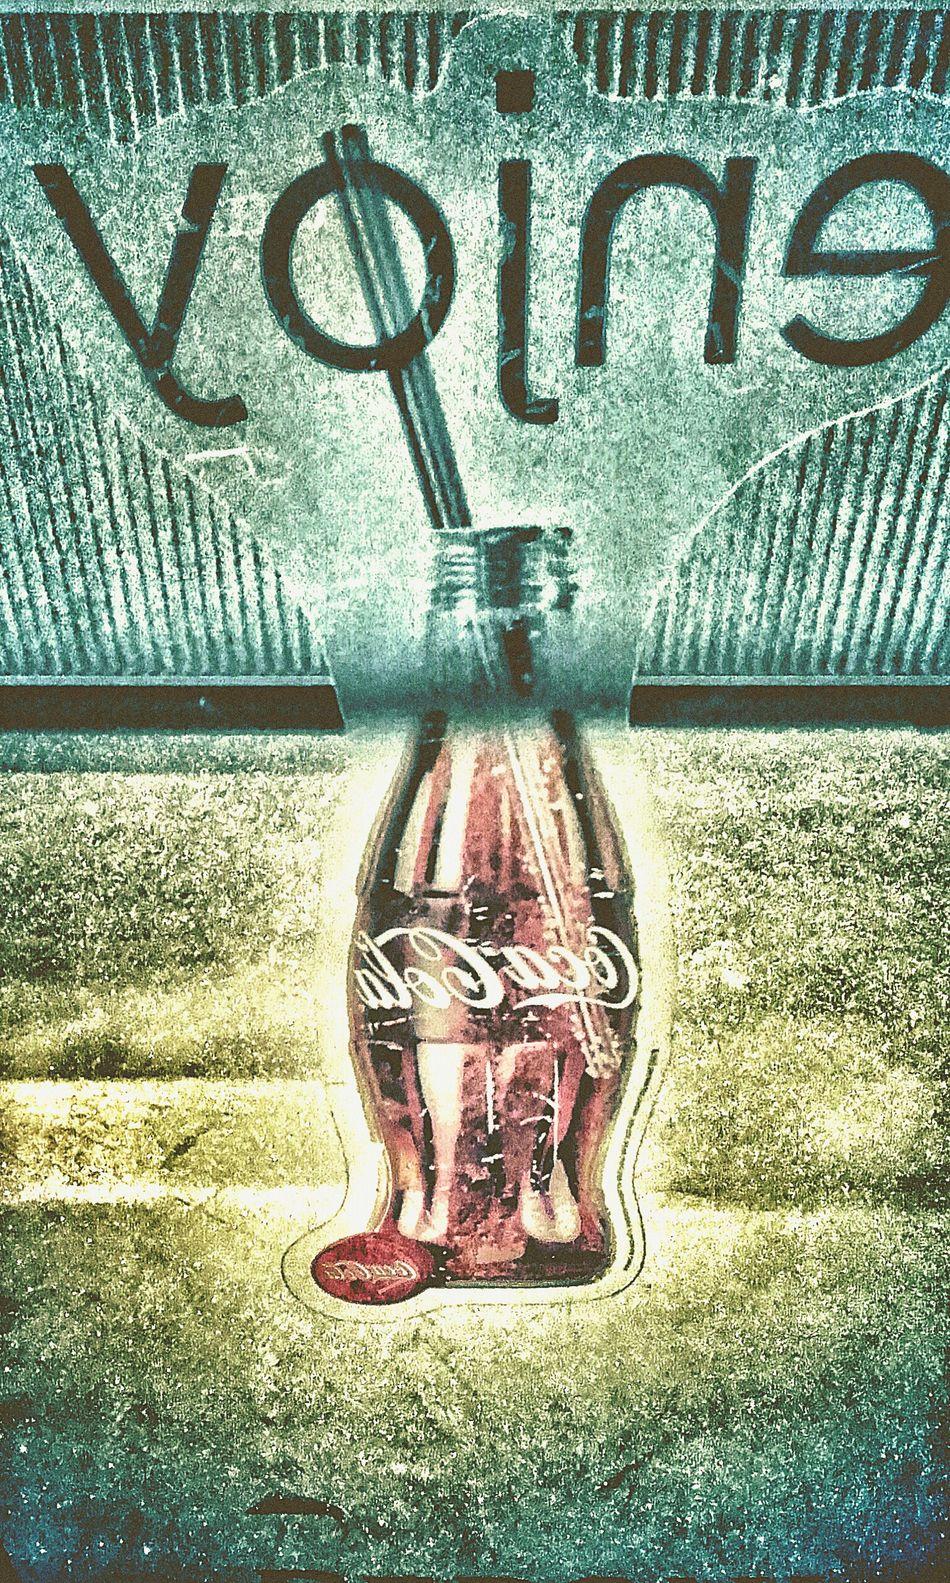 Enjoy Coca-Cola ❤ Coca-cola Signs Coke Bottle Coke Coca~Cola ® Coca Cola Coca~cola Cocacola Coca-Cola, Label/logo/sign Coca-cola❤️ Coke Bottles Mirror Image Signage Sign Reverse Perspective Reverse Image Yojne Reversed Image Reversed Perspective Coca-Cola, Logo/label/sign/poster Poster Posters Signs_collection